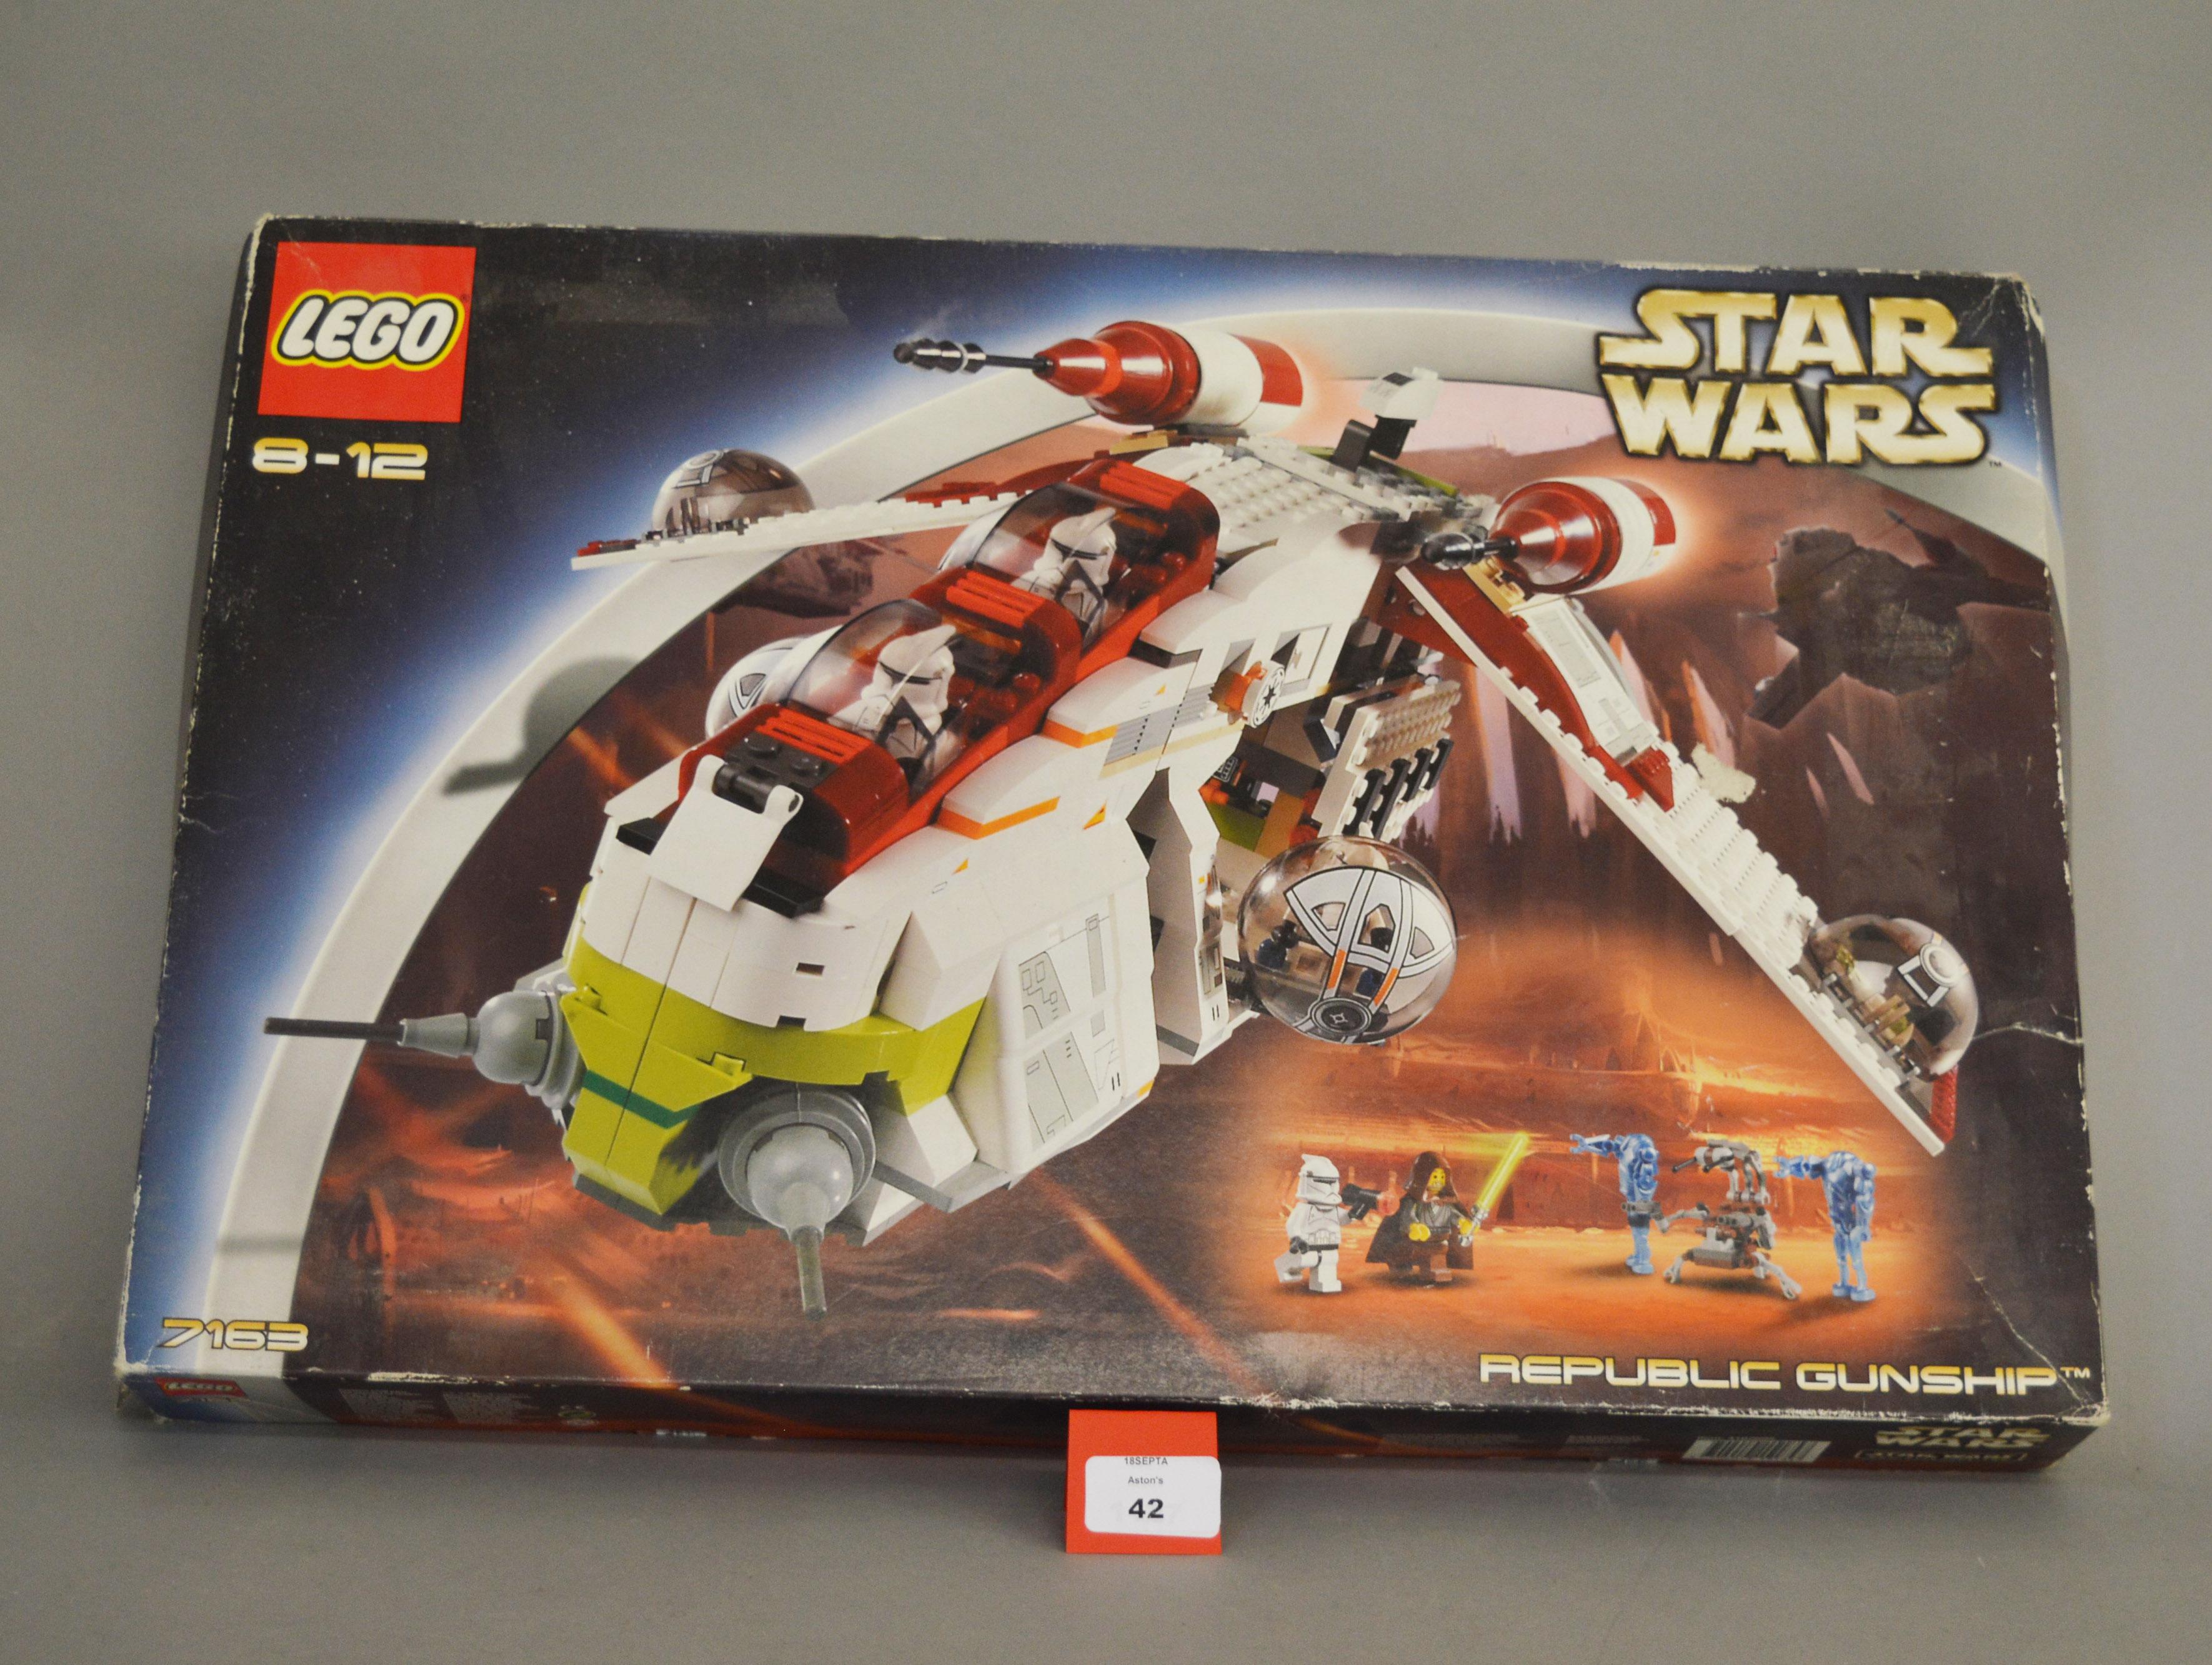 Lot 42 - Lego Star Wars 7163 'Republic Gunship', in generally G box with some undulation, creasing,